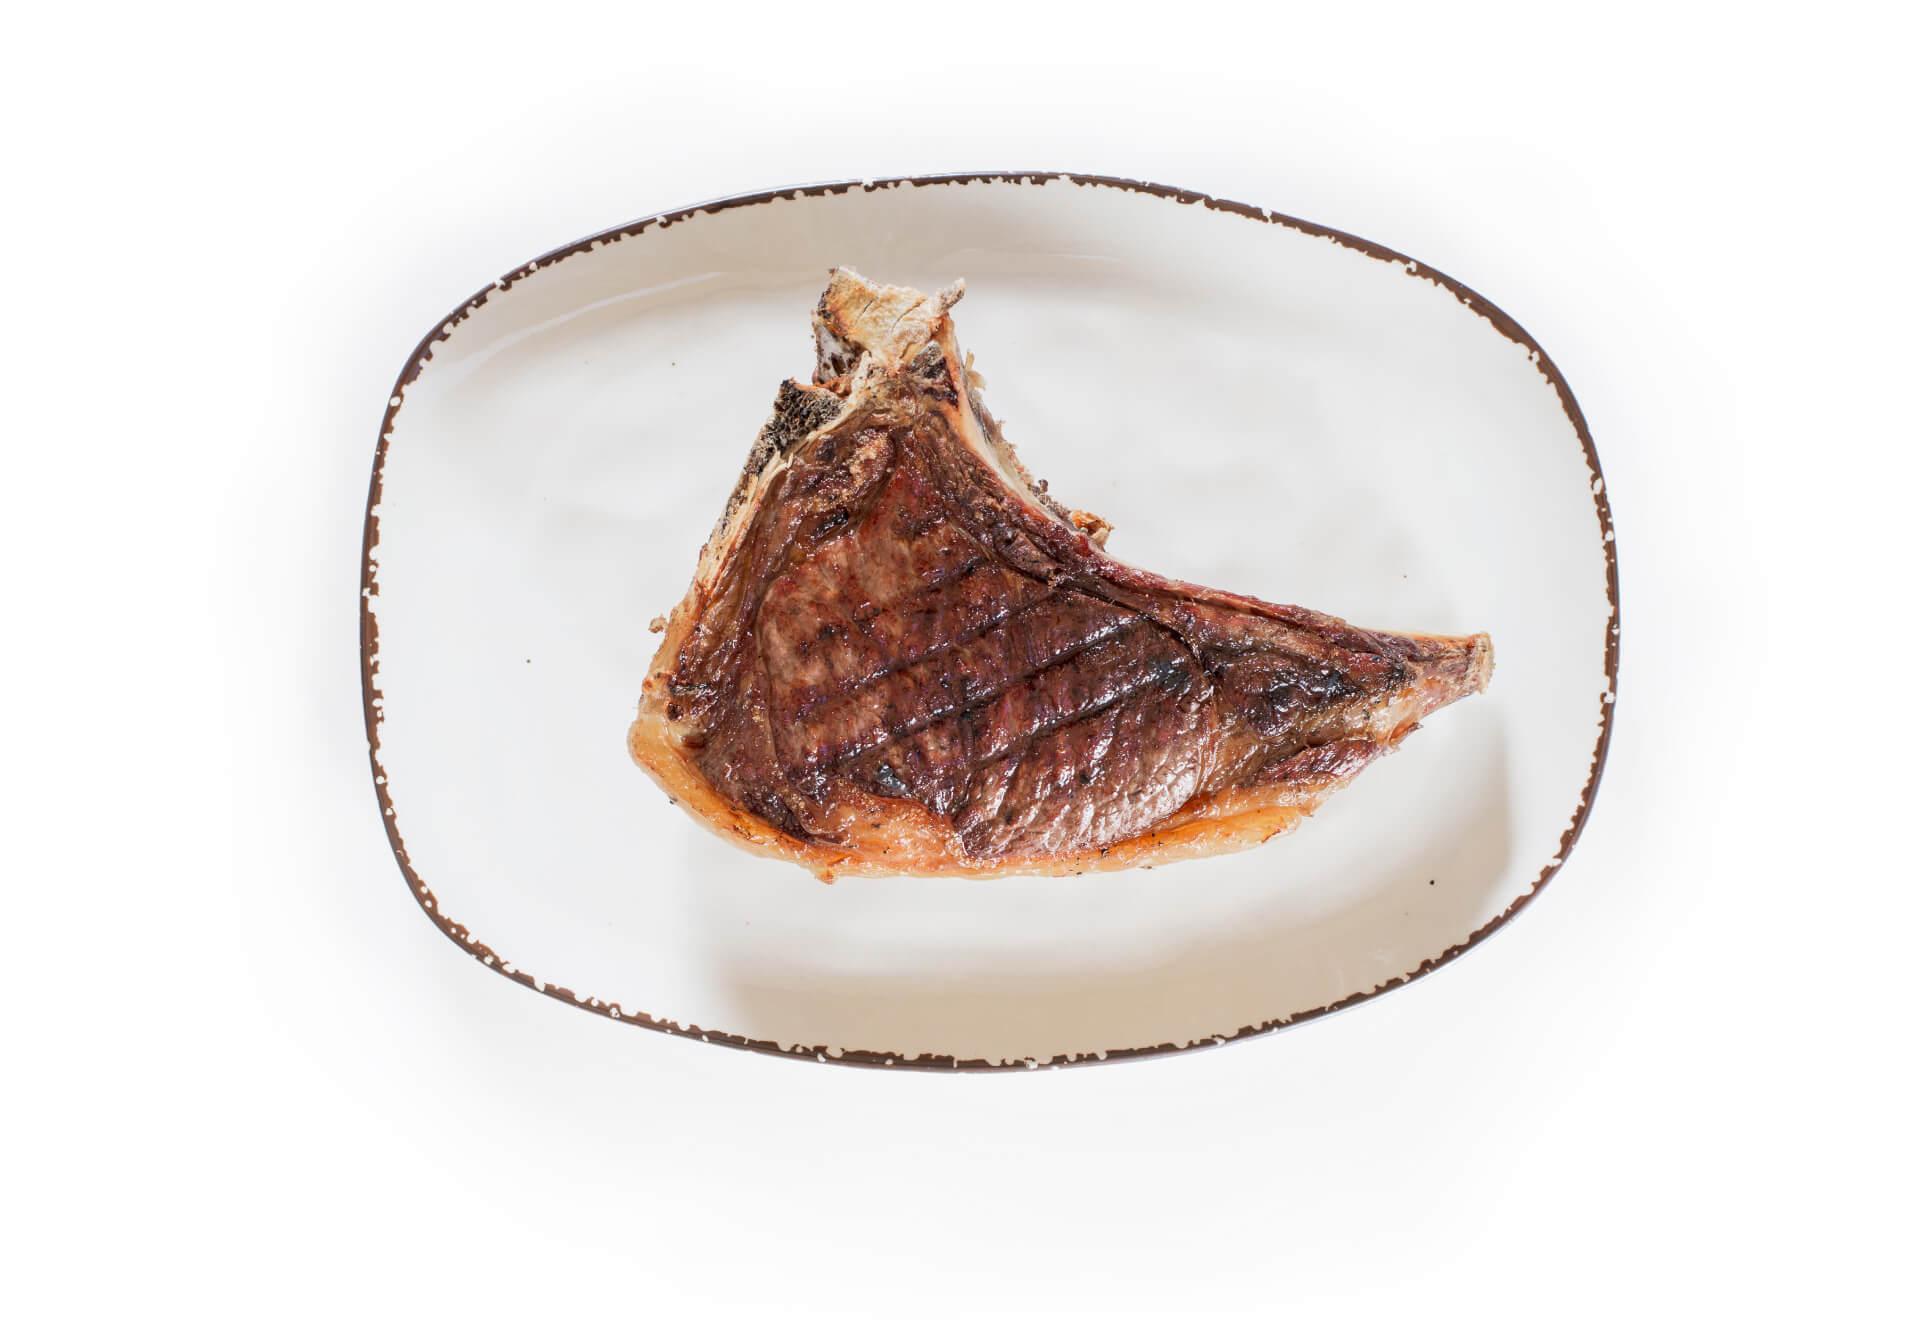 Steak Home - Serravalle Pistoiese - location - dry aging - bistecca - costata - frollatura due,quattro settimane 2